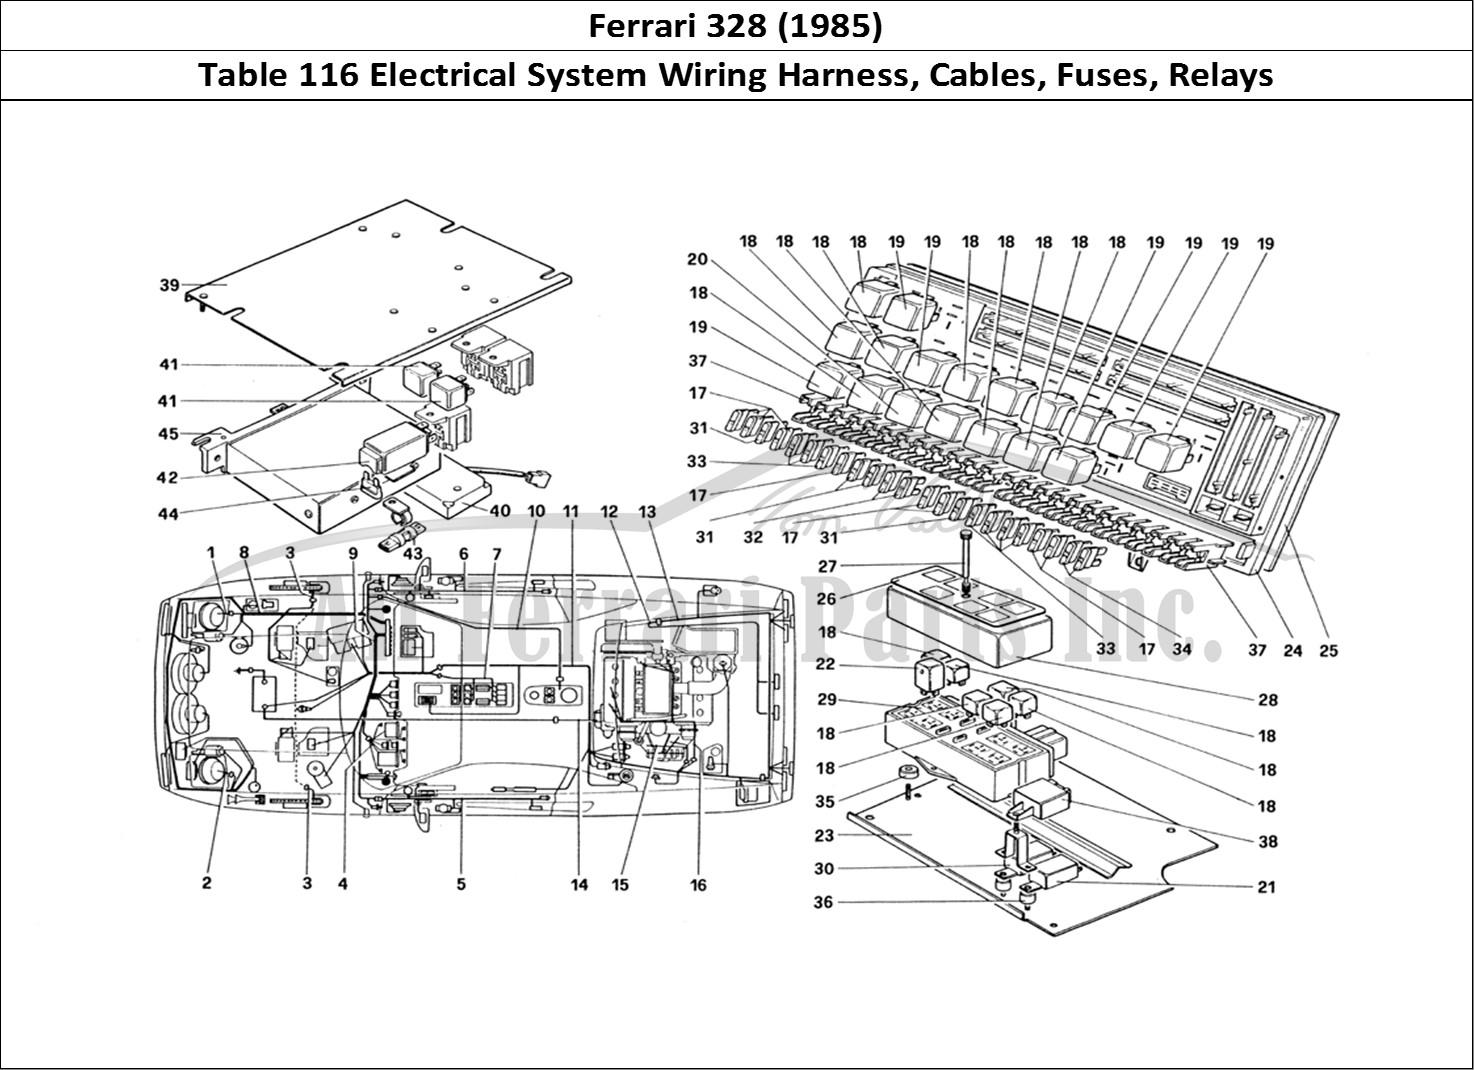 Buy Original Ferrari 328 116 Electrical System